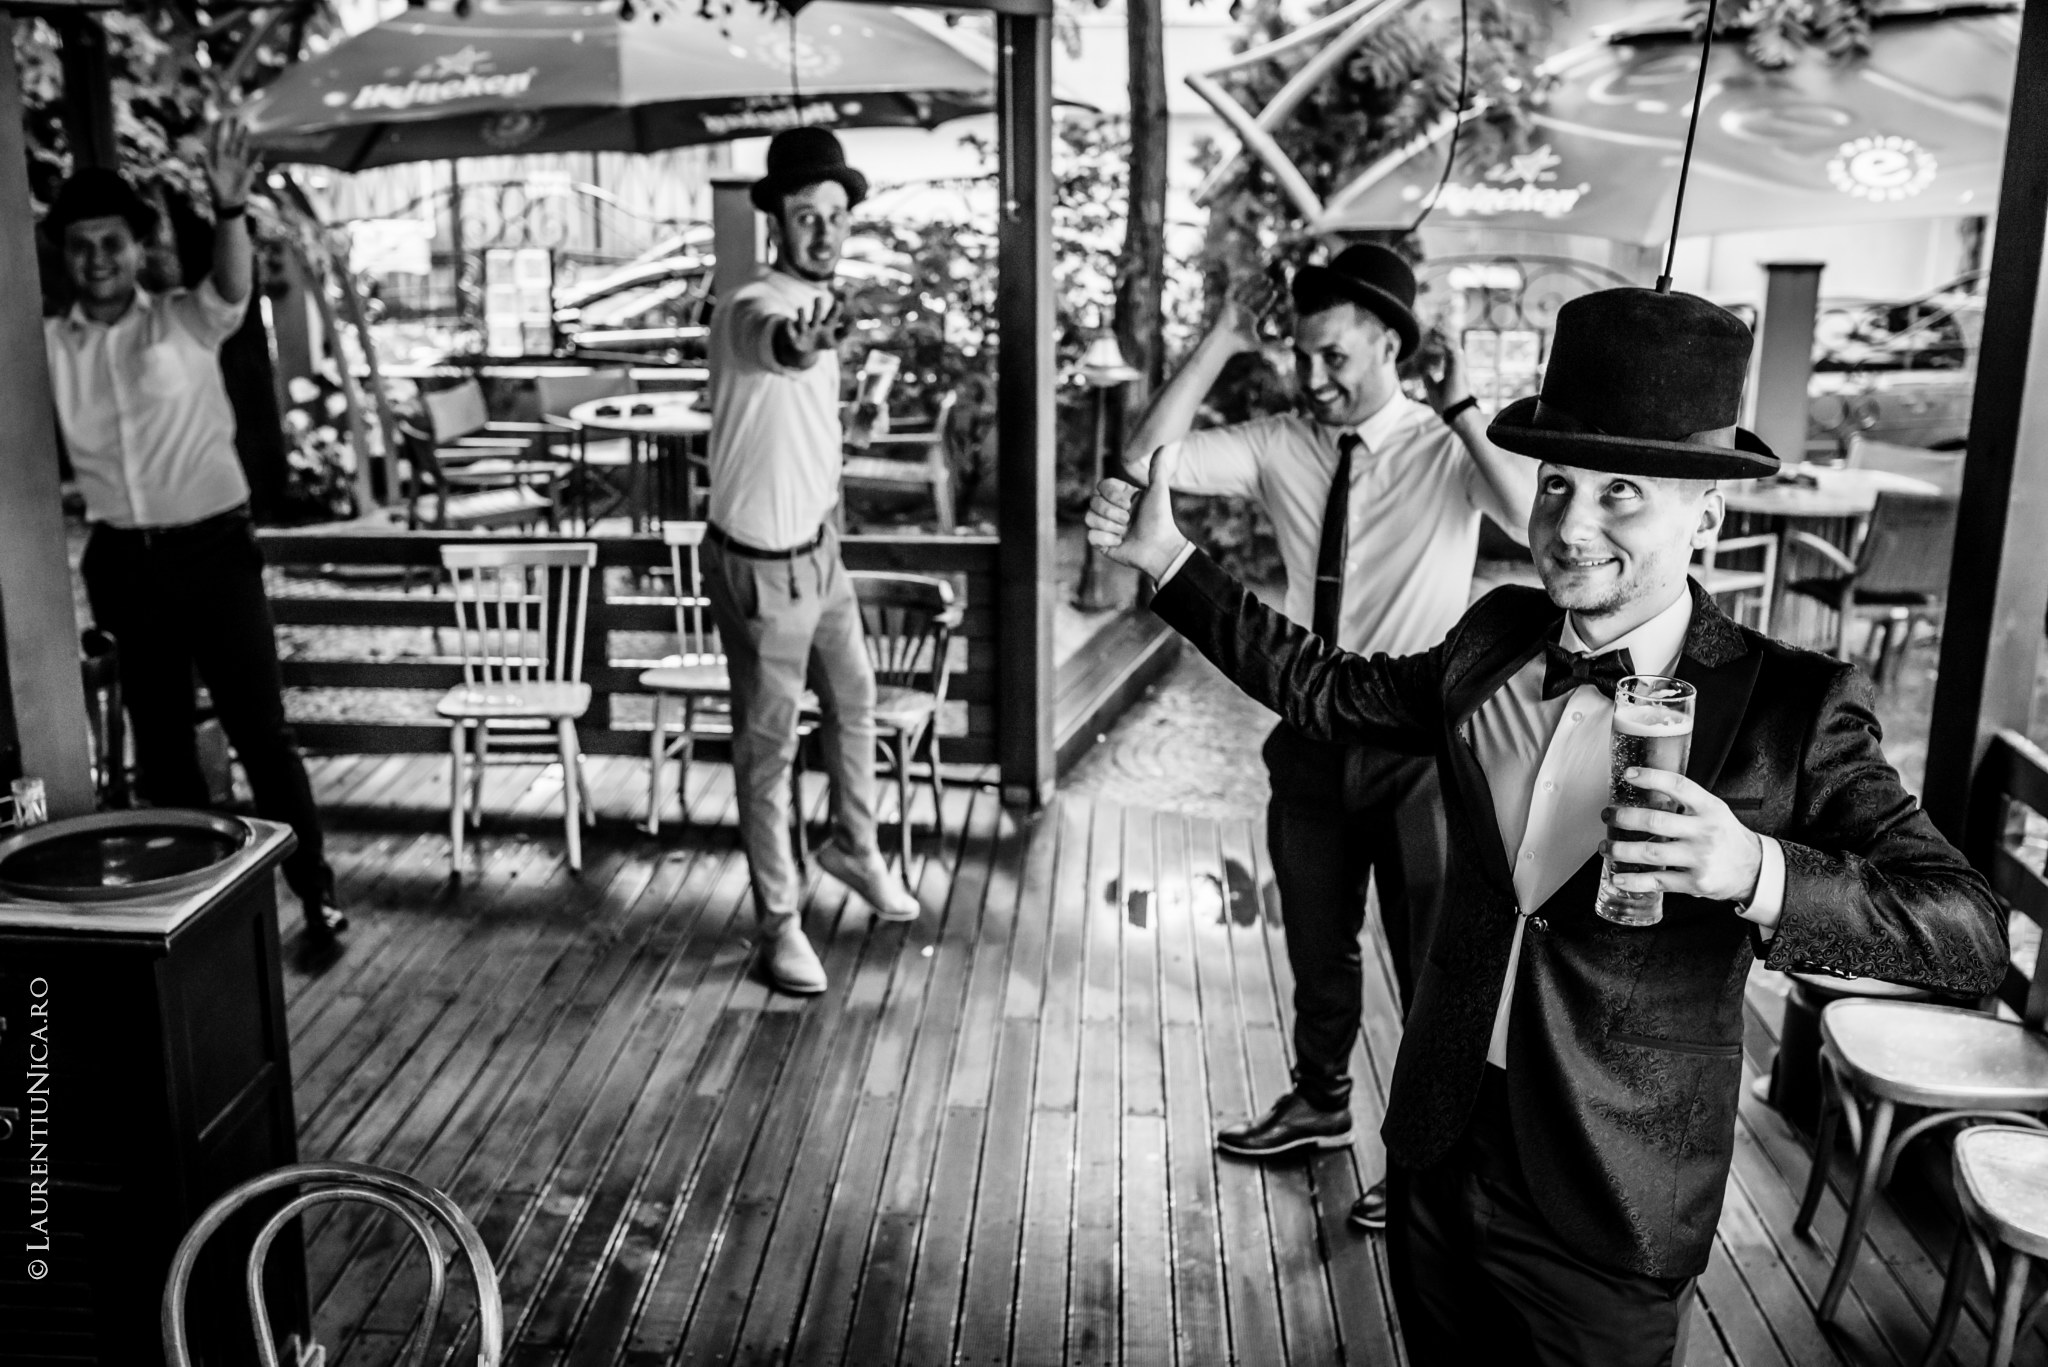 fotografii nunta craiova bia alex fotograf nunta laurentiu nica 04 - Bia & Alex | Fotografii nunta | Craiova